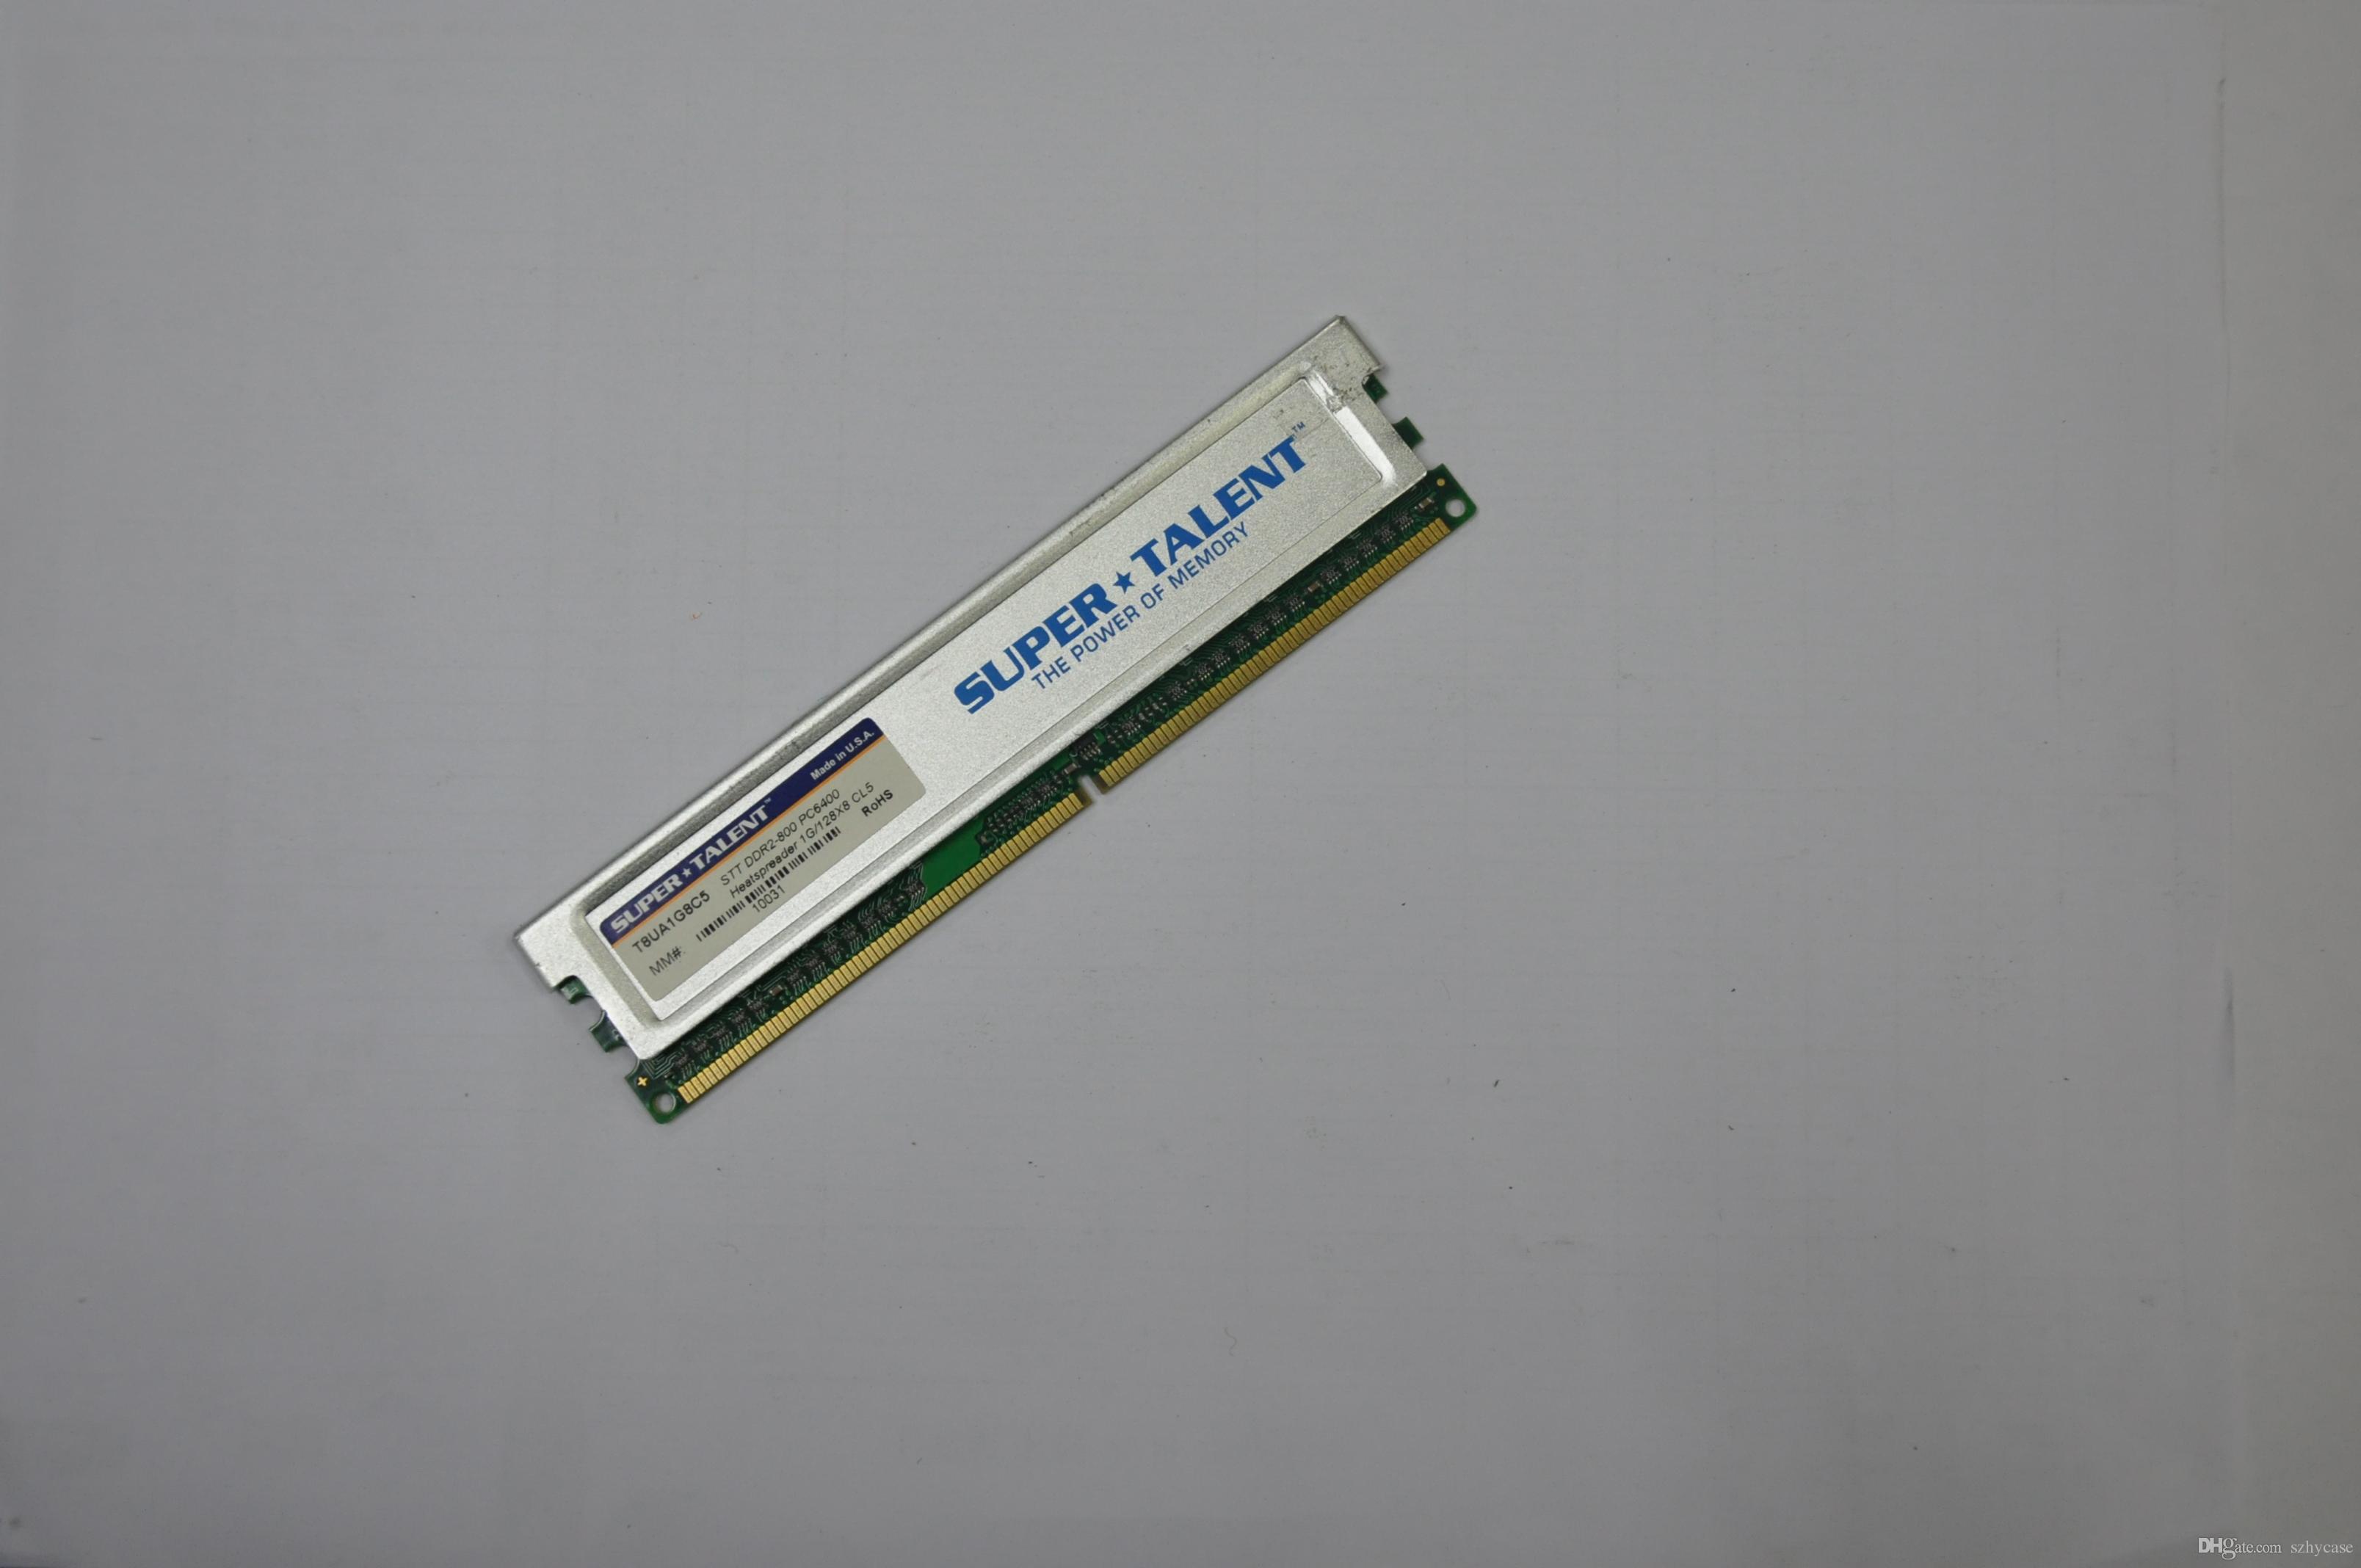 98 1gb Memeory Asa5510 Mem Ram Memory Upgrade For Cisco Parts Ddr2 Pc 6400 Dan 5300 Super Talent 800pc6400 128x8 T8ua1g8c5 Or 1g